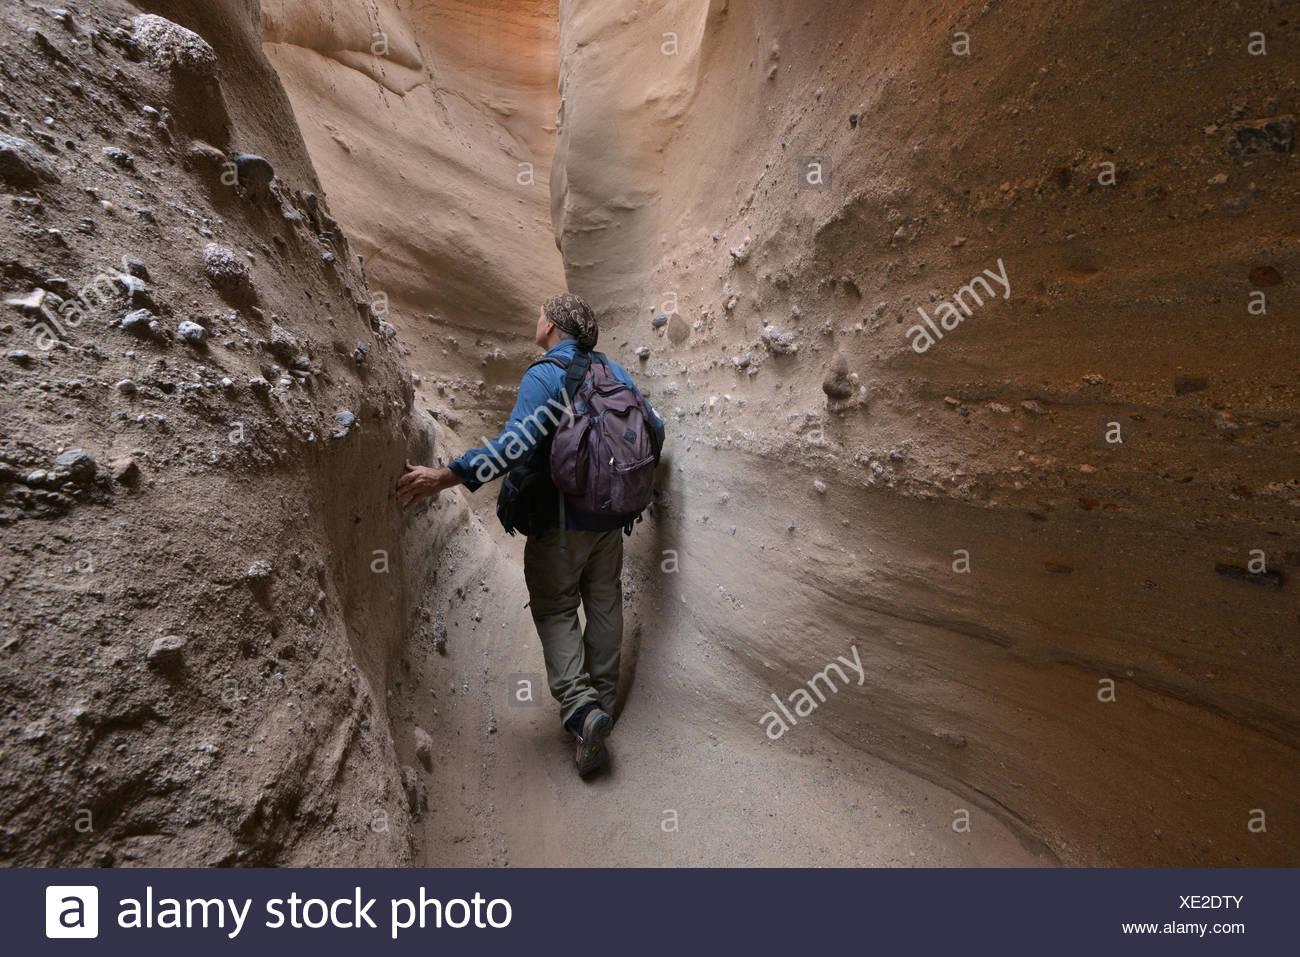 USA, California, Anza-Borrego Desert State Park, Hiker Walking Through Palm Canyon Slot Canyon - Stock Image